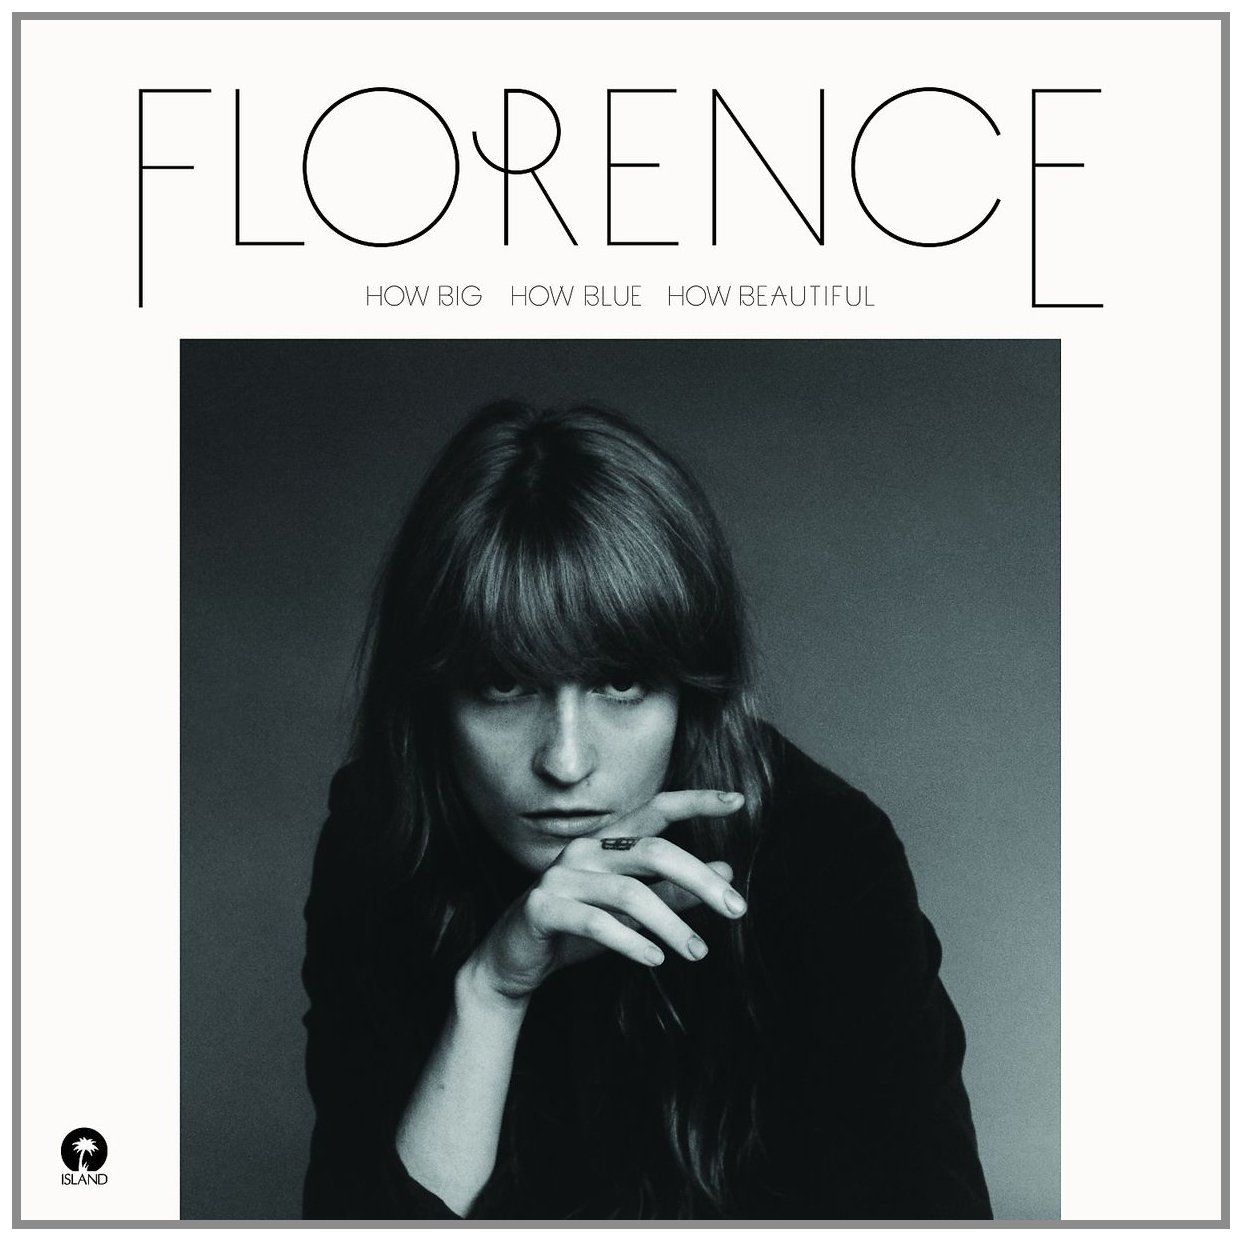 How Big, How Blue, How Beautiful (2LP) [Vinyl LP] - FlorenceThe Machine